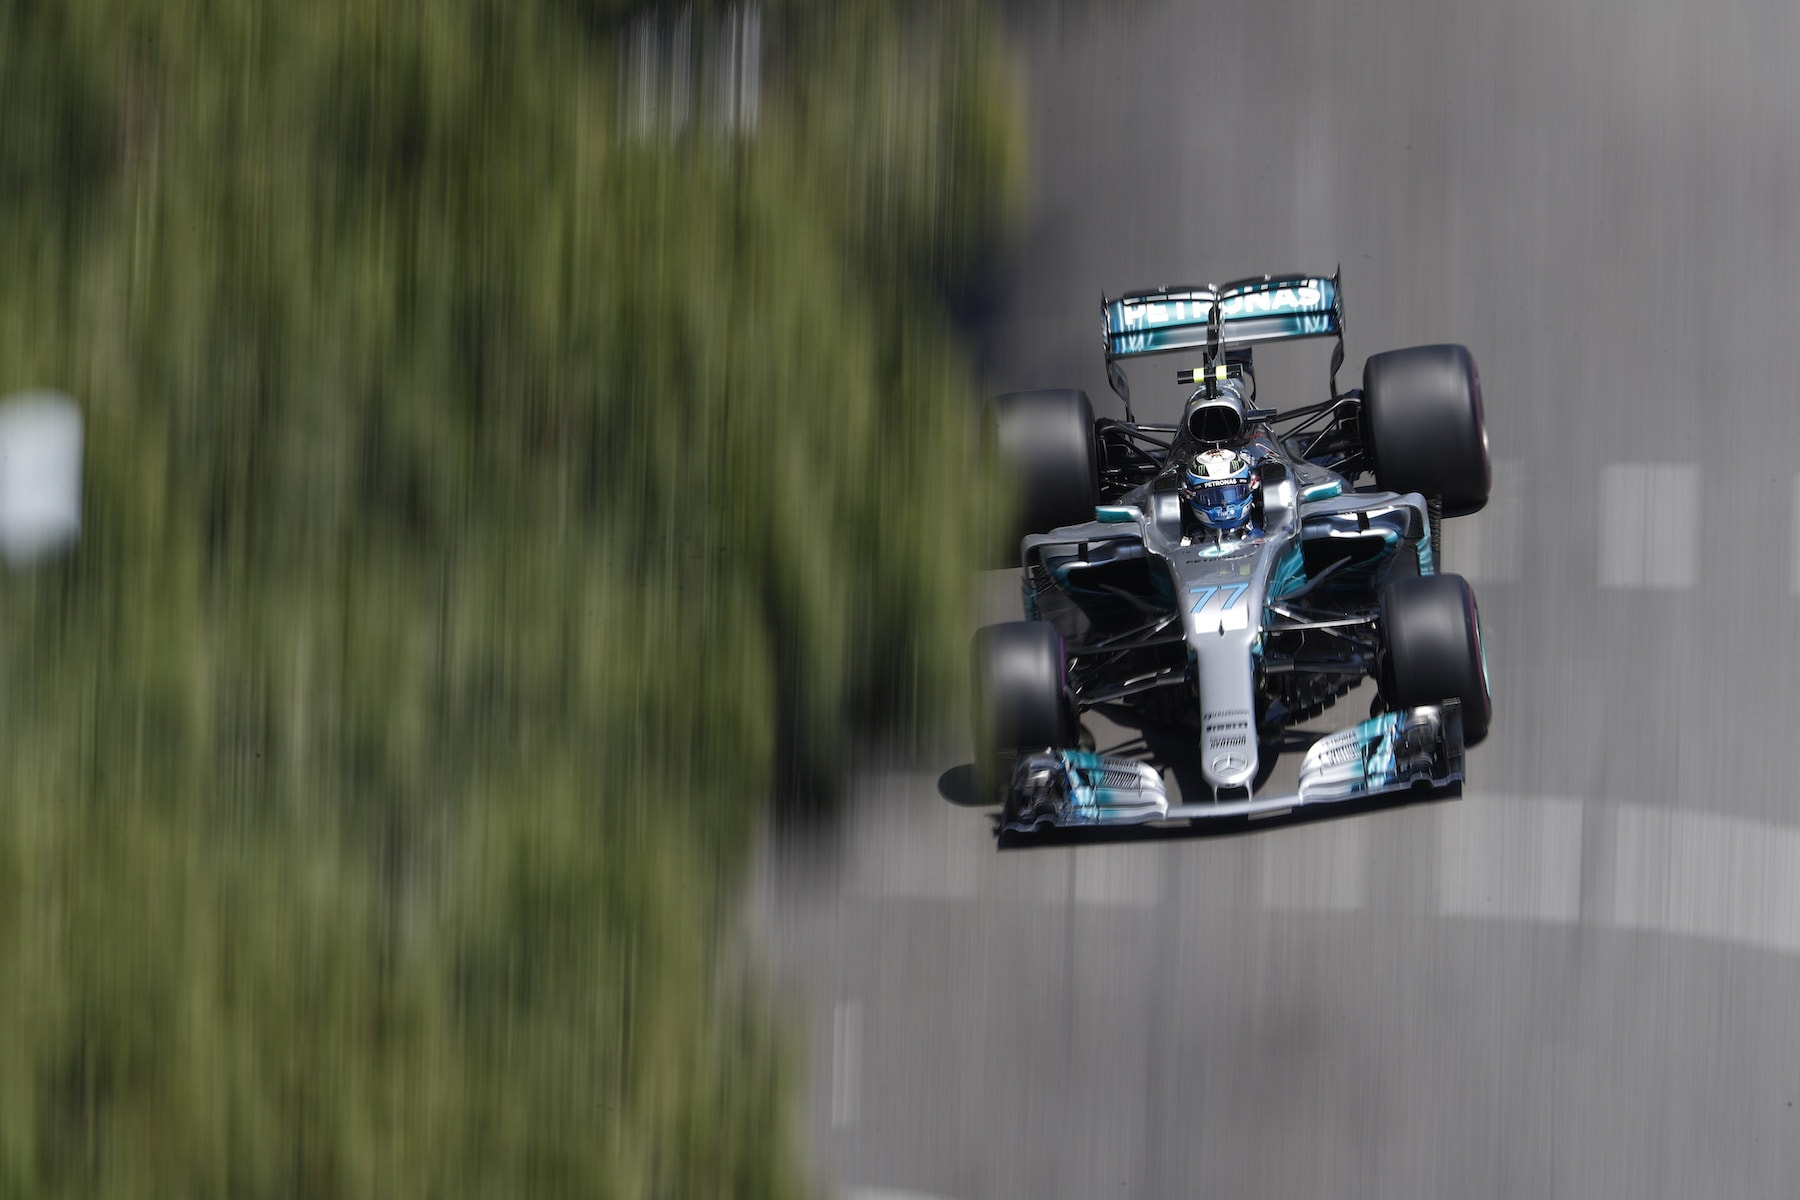 H 2017 Valtteri Bottas | Mercedes W08 | 2017 Monaco GP P4 6 copy.JPG